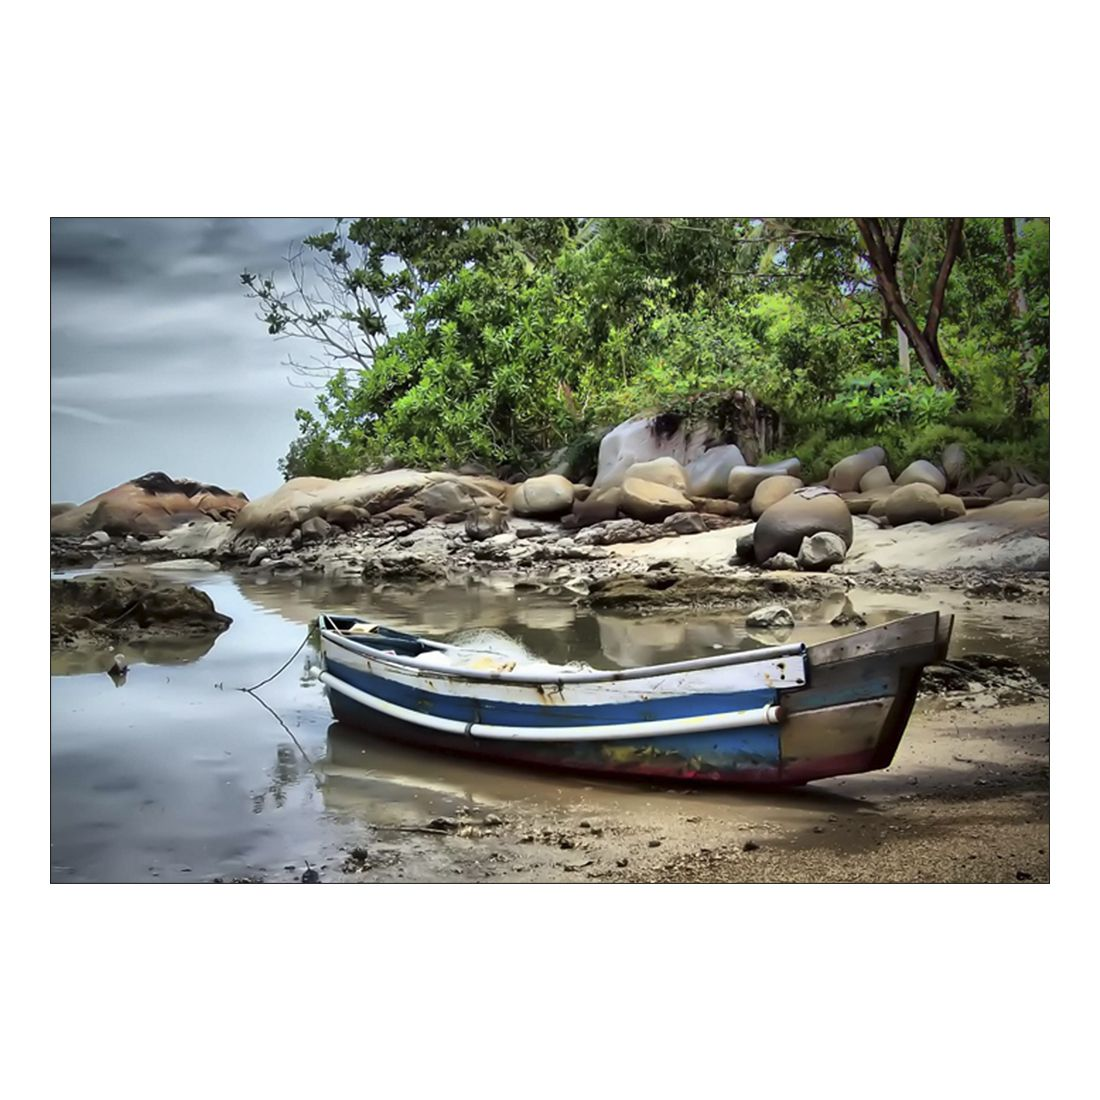 Acrylglasbild Boat – Abmessung 30×20 cm, Gallery of Innovative Art günstig online kaufen